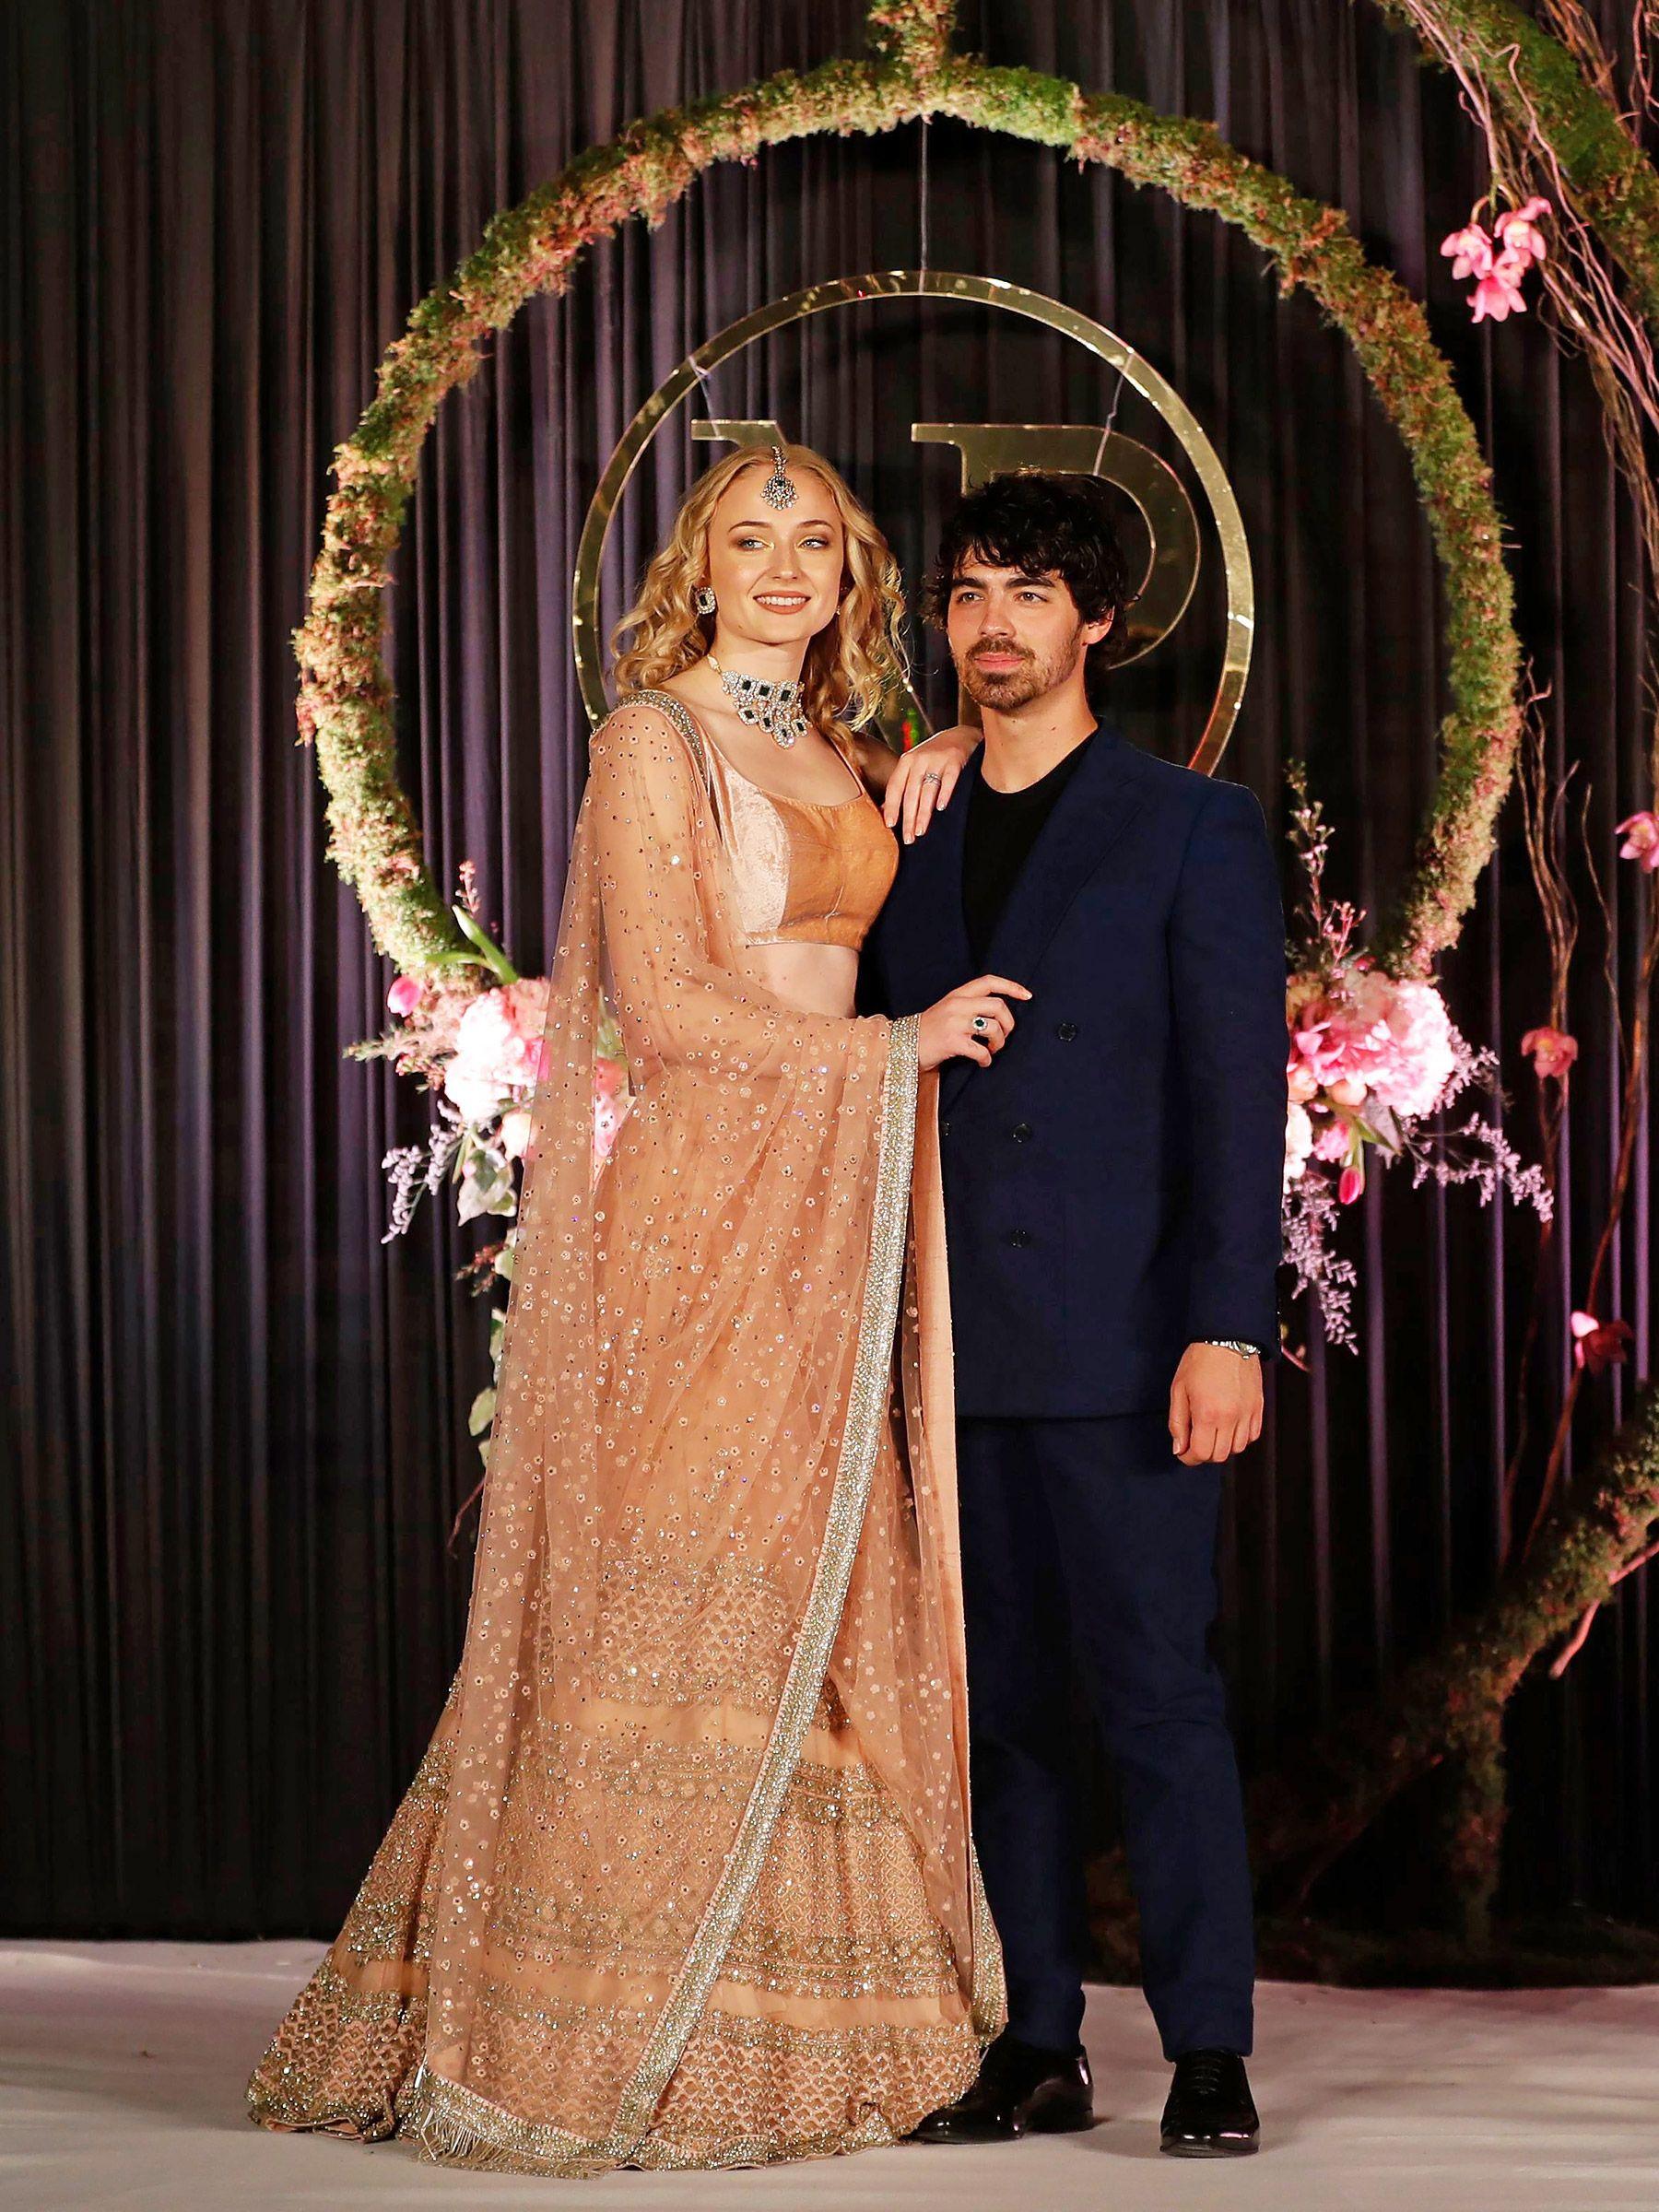 Priyanka Chopra And Nick Jonas Continue Their Lavish Wedding Celebrations With Delhi Reception Priyanka Chopra Wedding Bollywood Celebrities Wedding Outfit